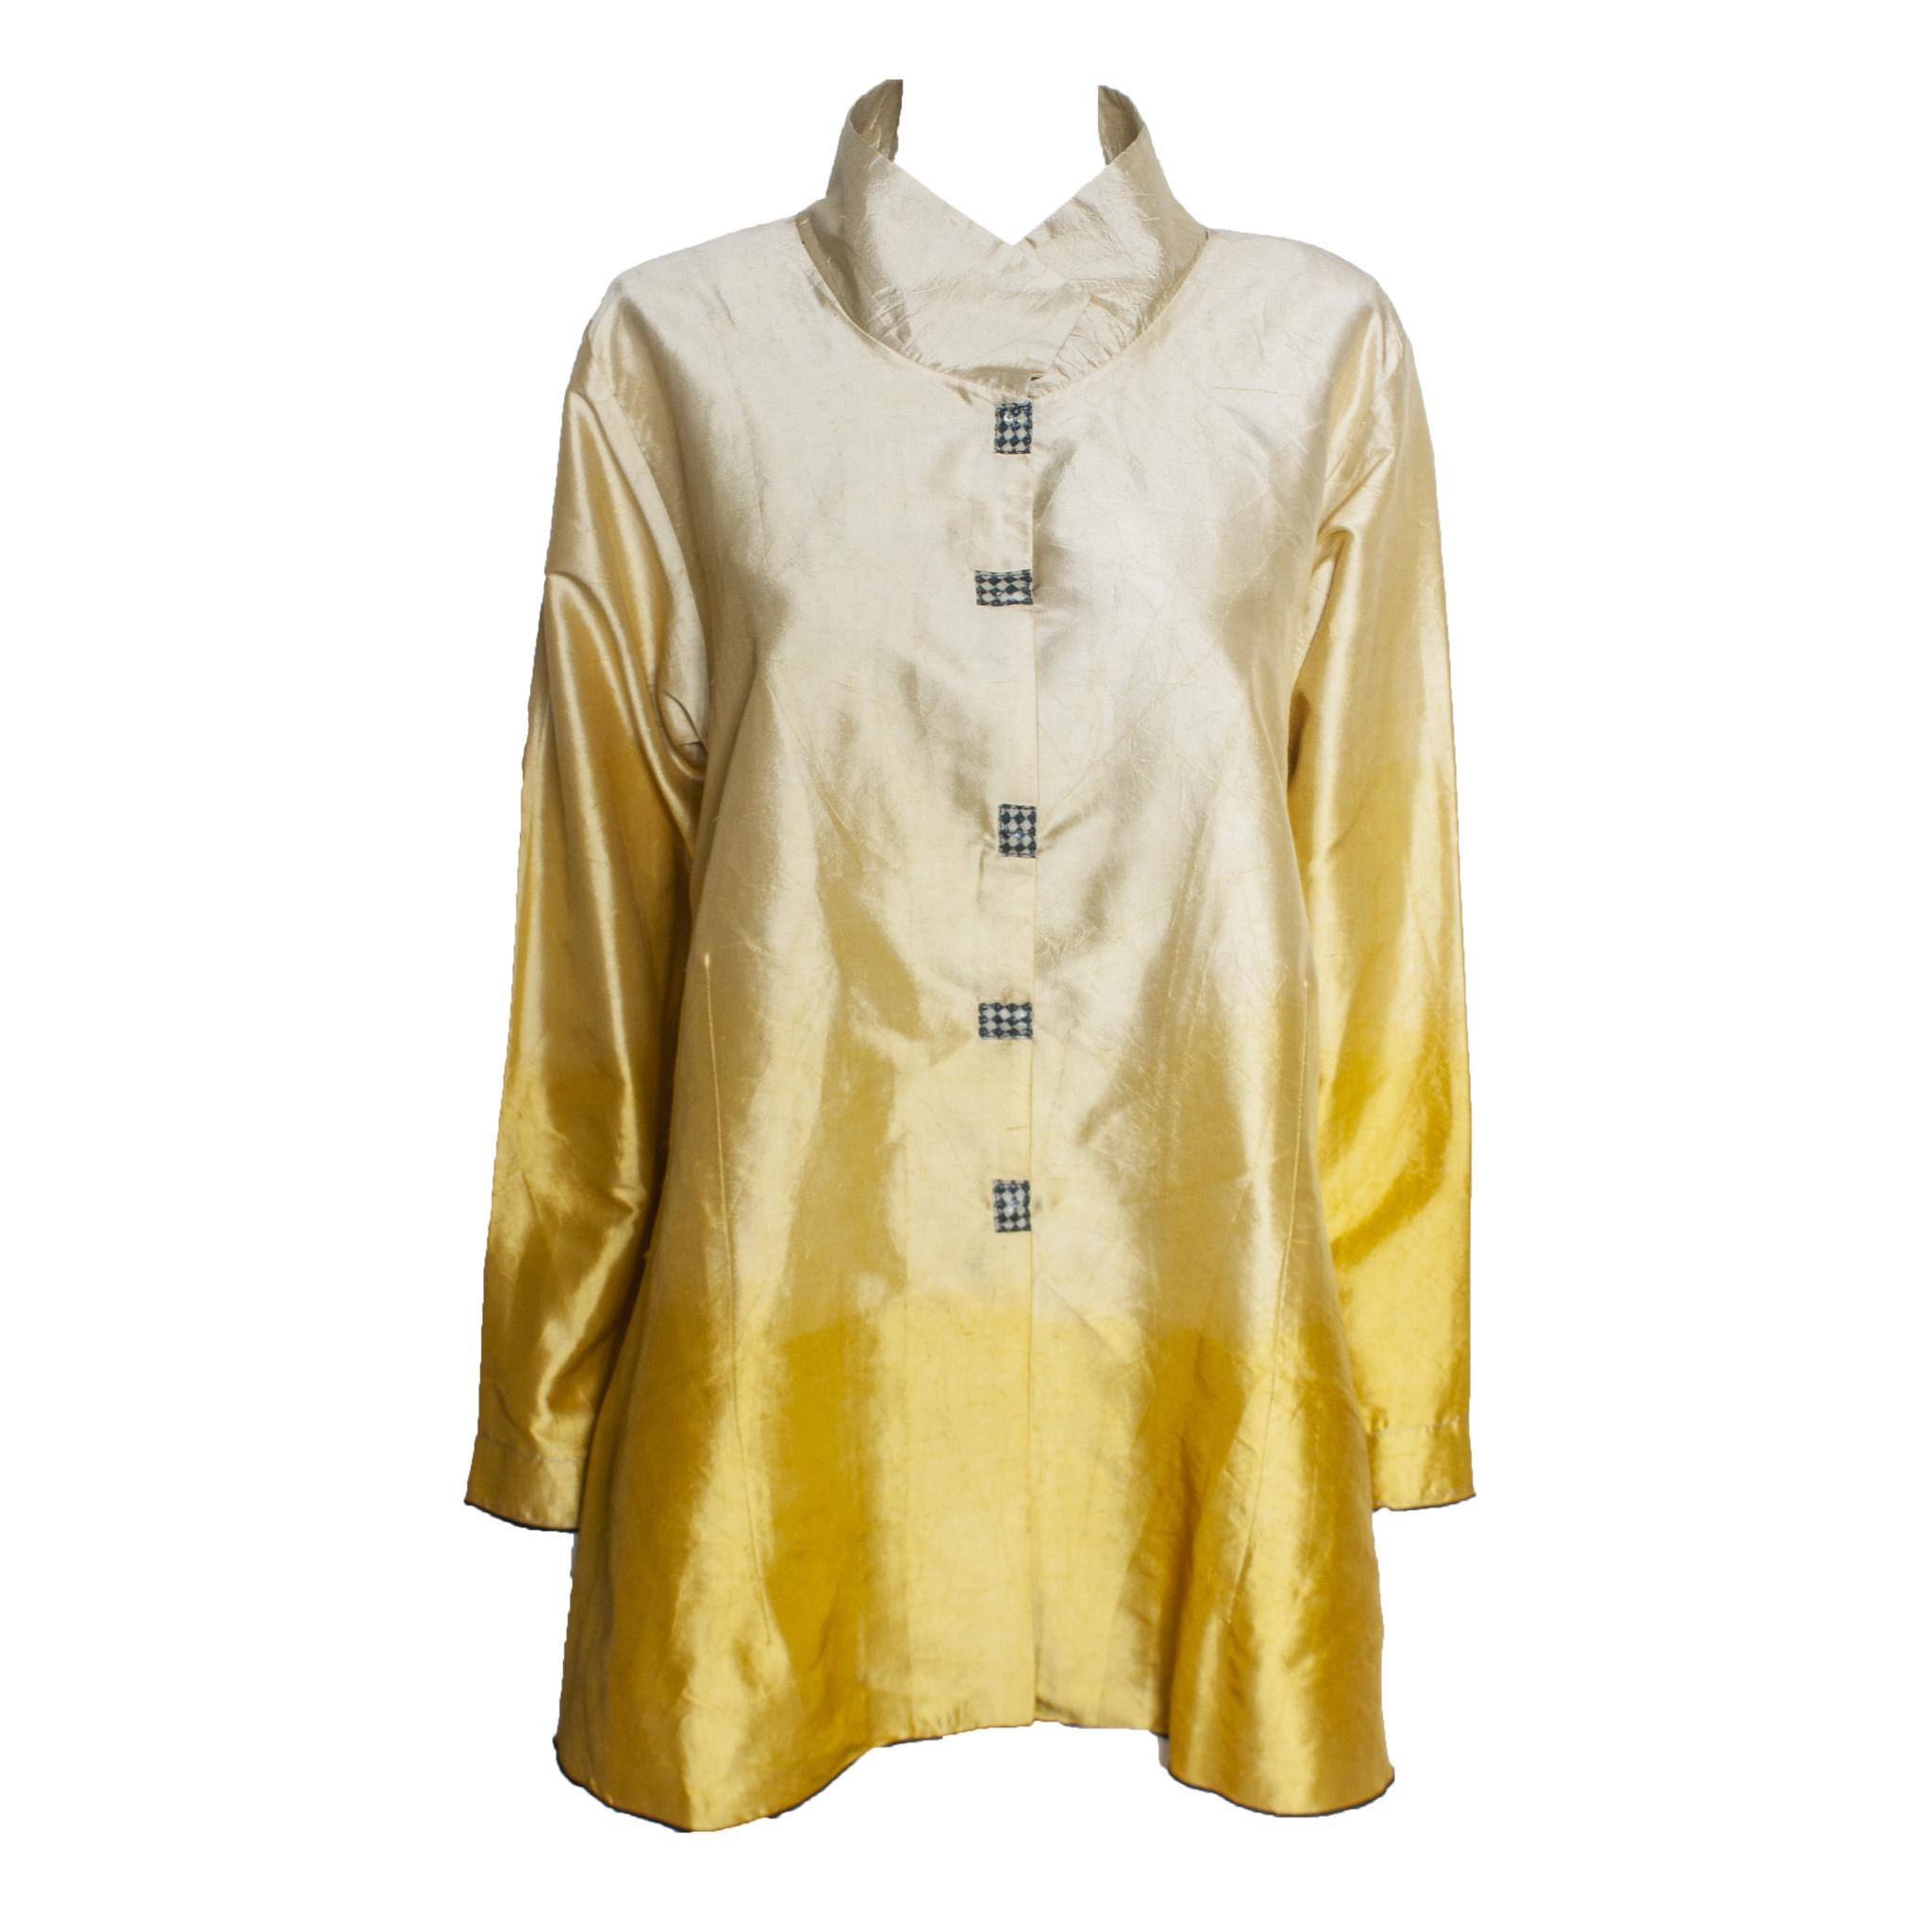 Deborah Cross Deborah Cross Fitted Shirt - Gold